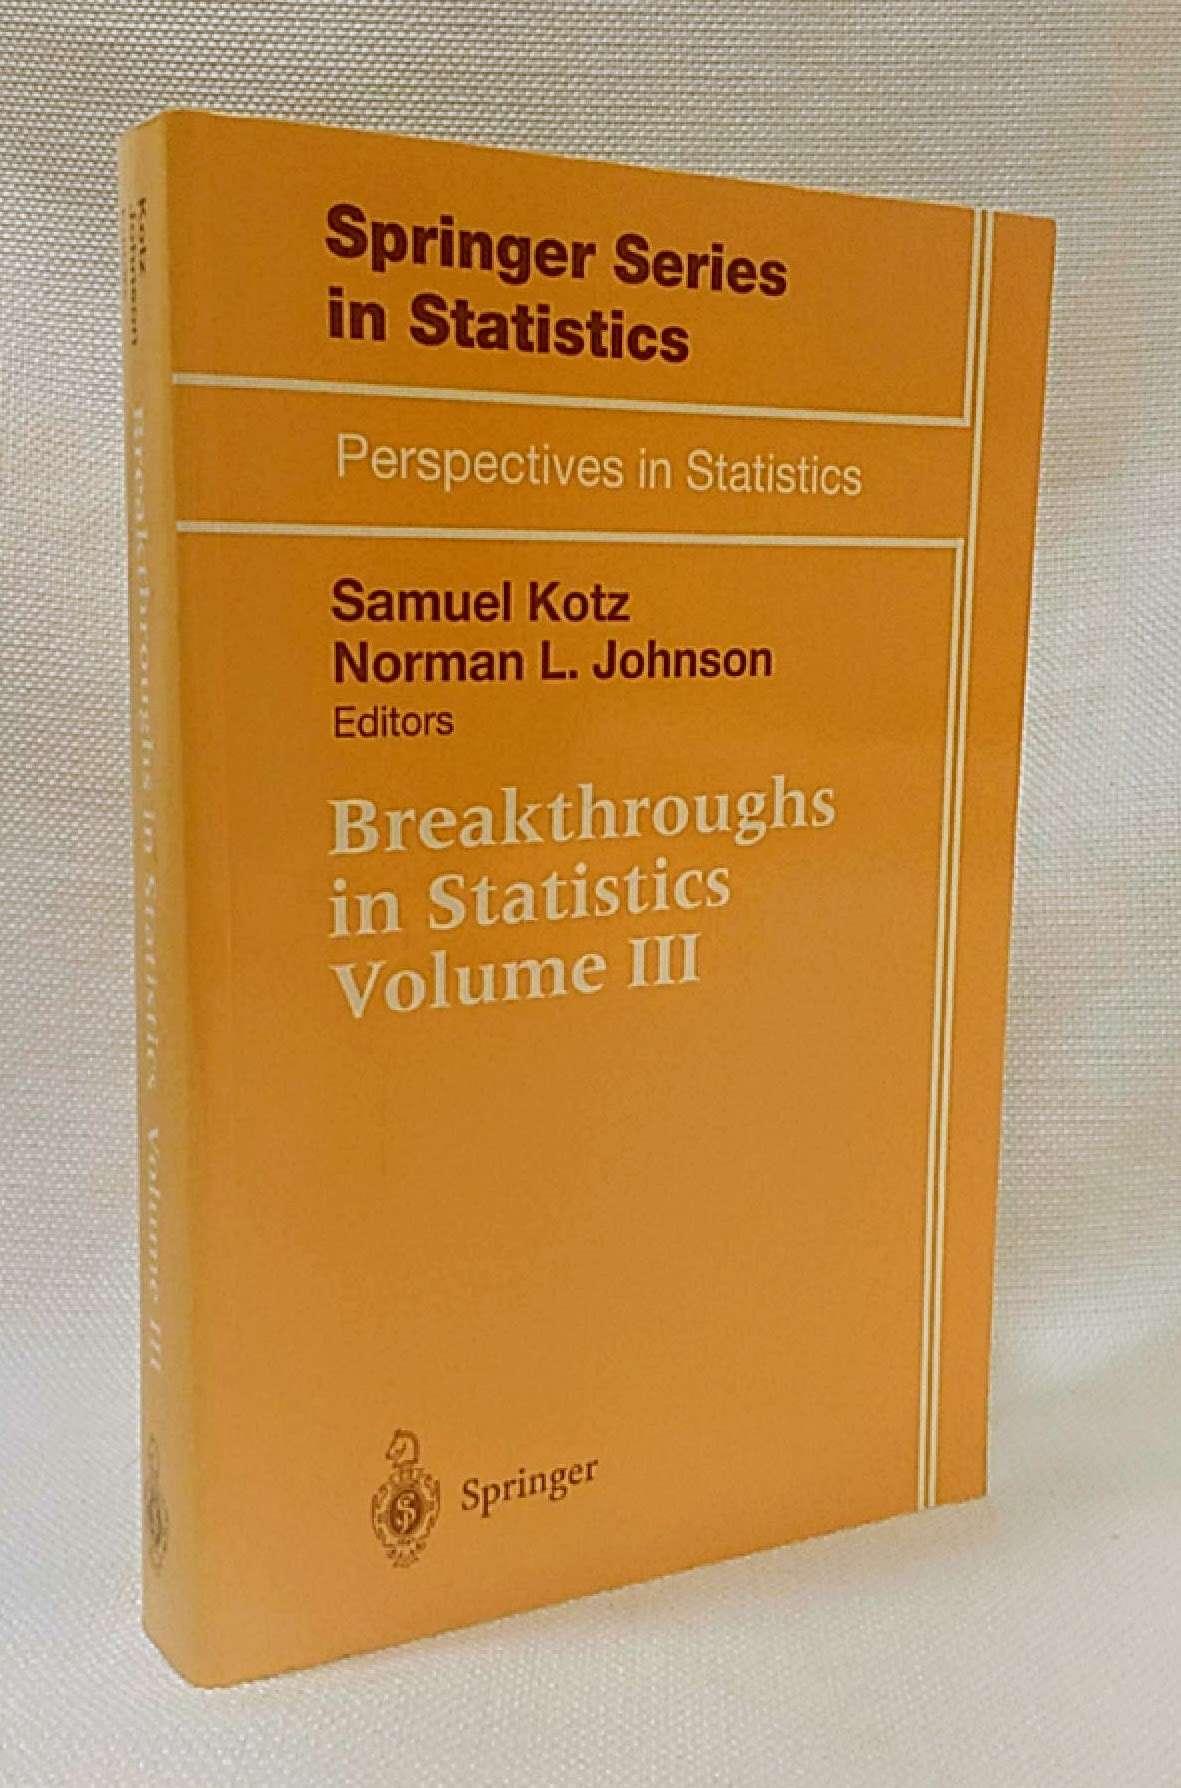 Breakthroughs in Statistics (Springer Series in Statistics), Kotz, Samuel [Editor]; Johnson, Norman L. [Editor];